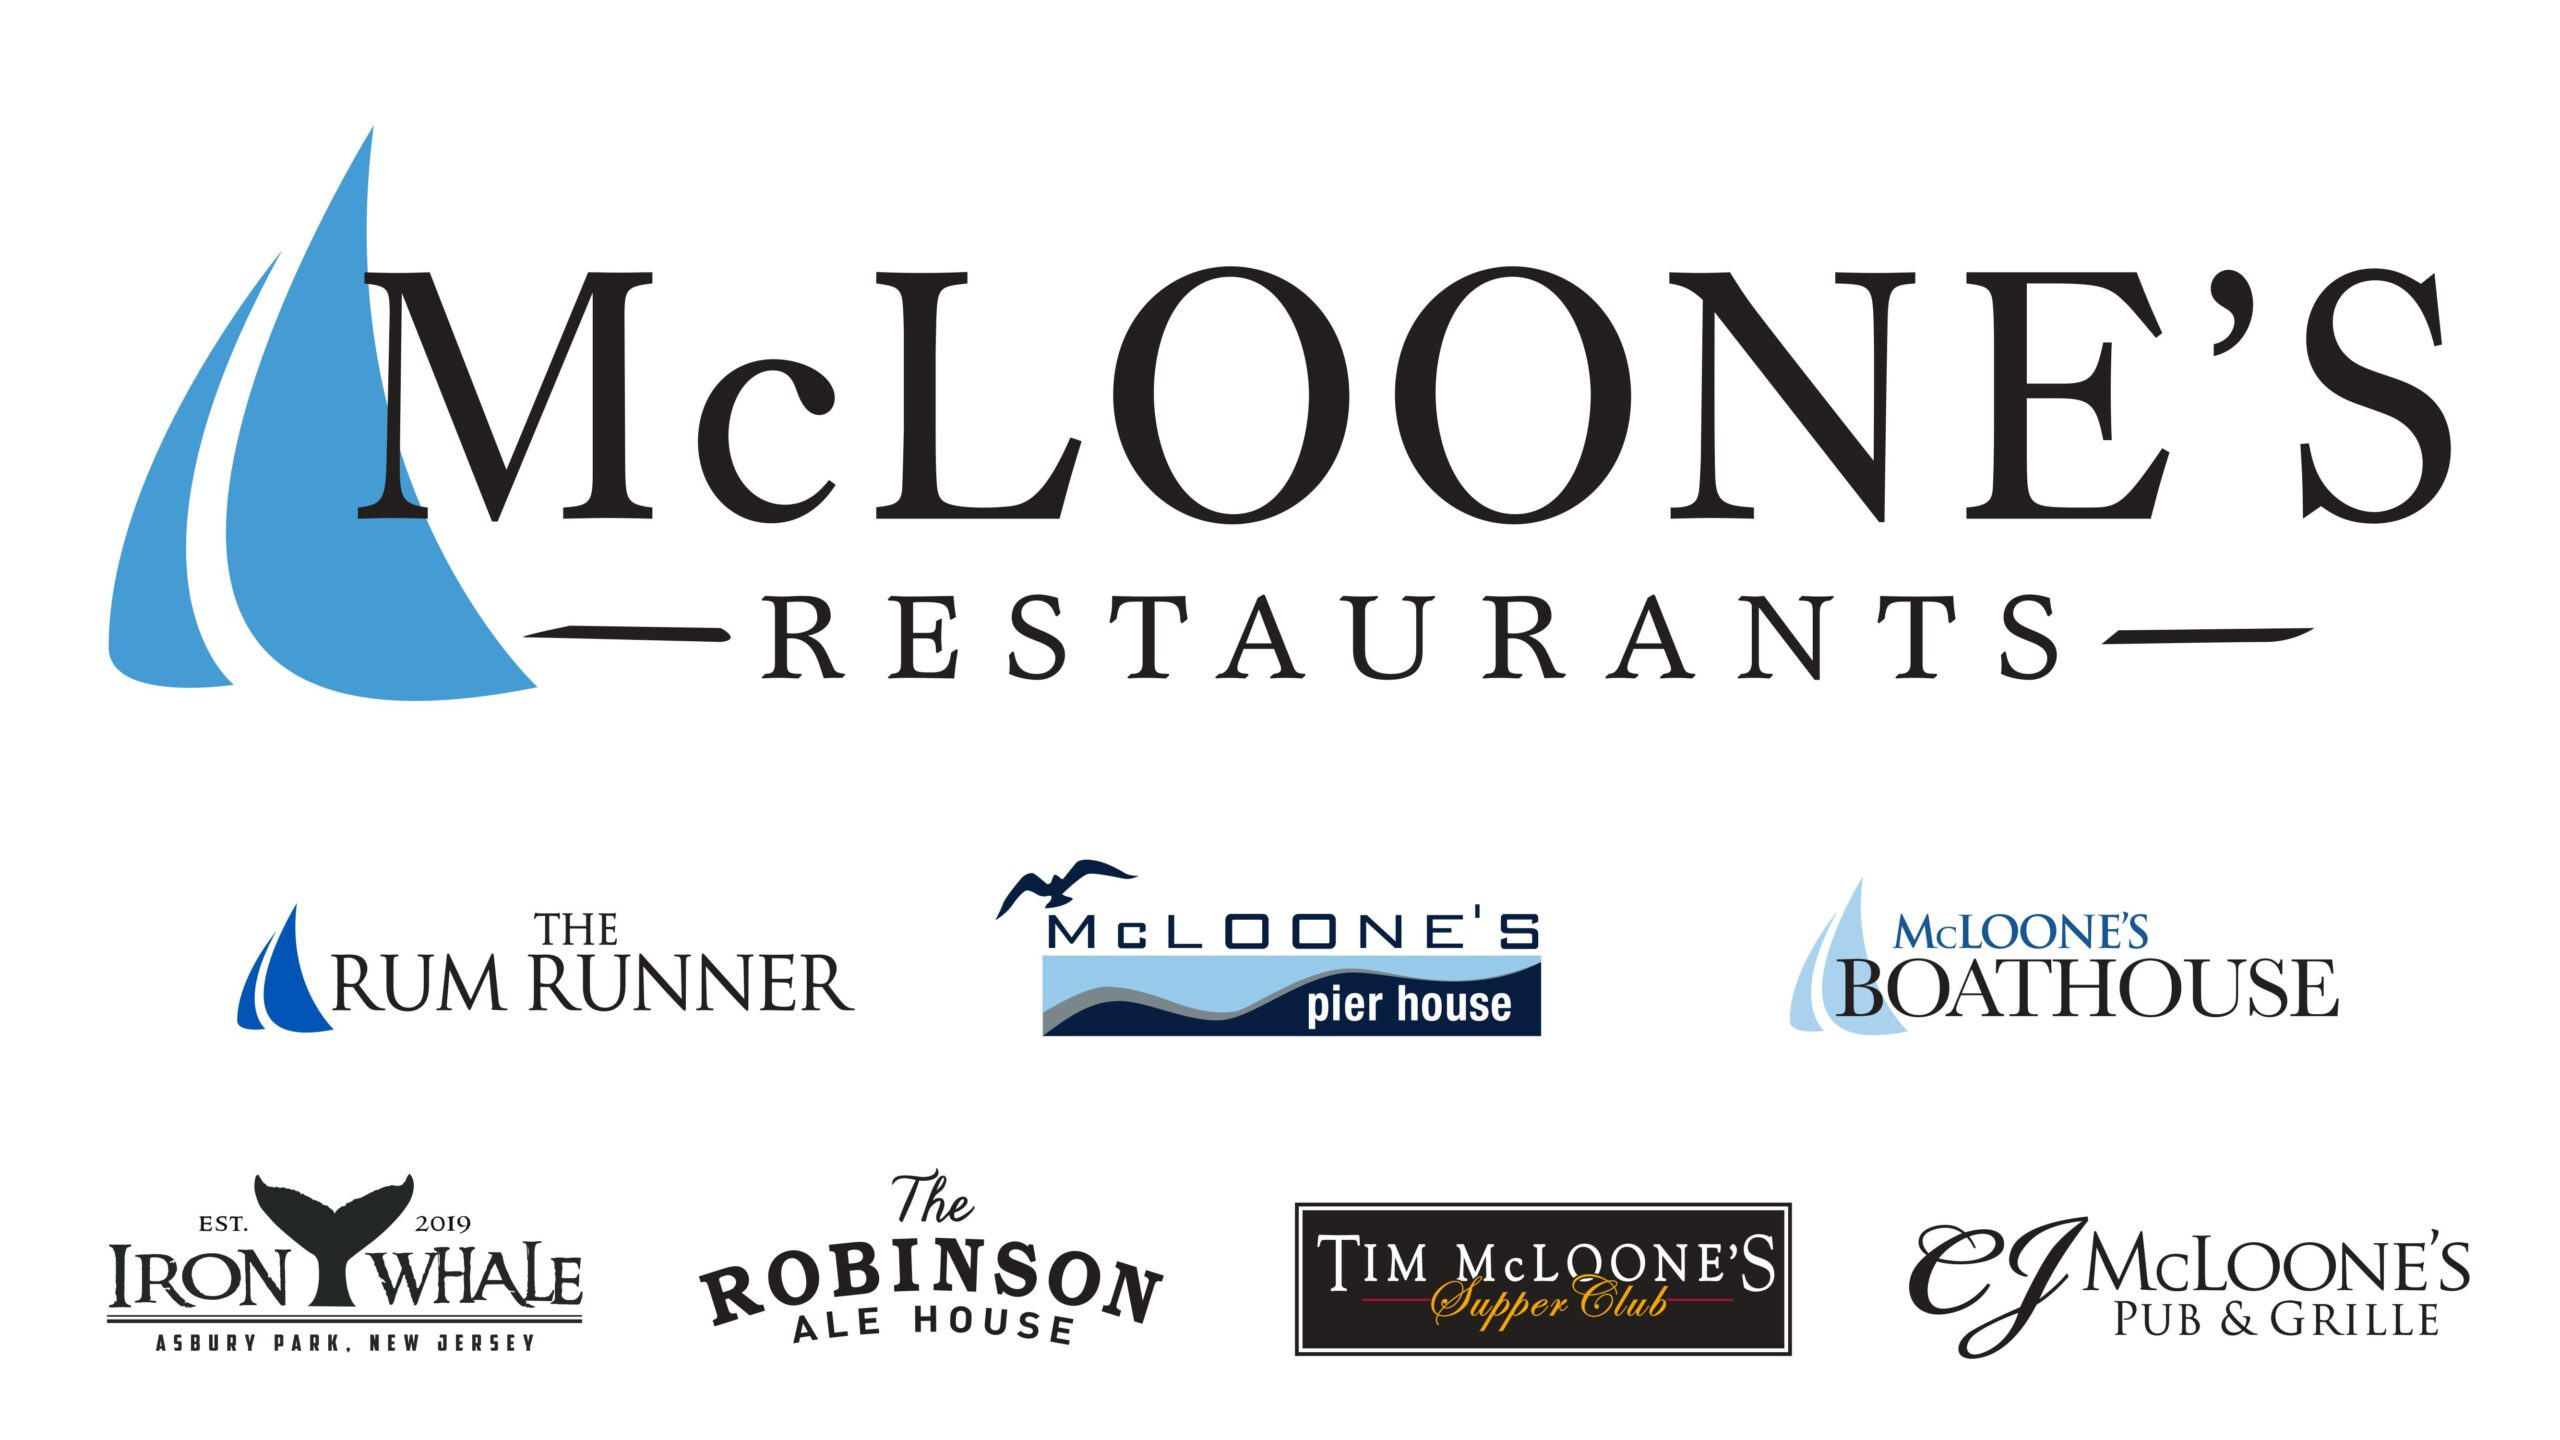 McLoone's Restaurants LOGO jpeg